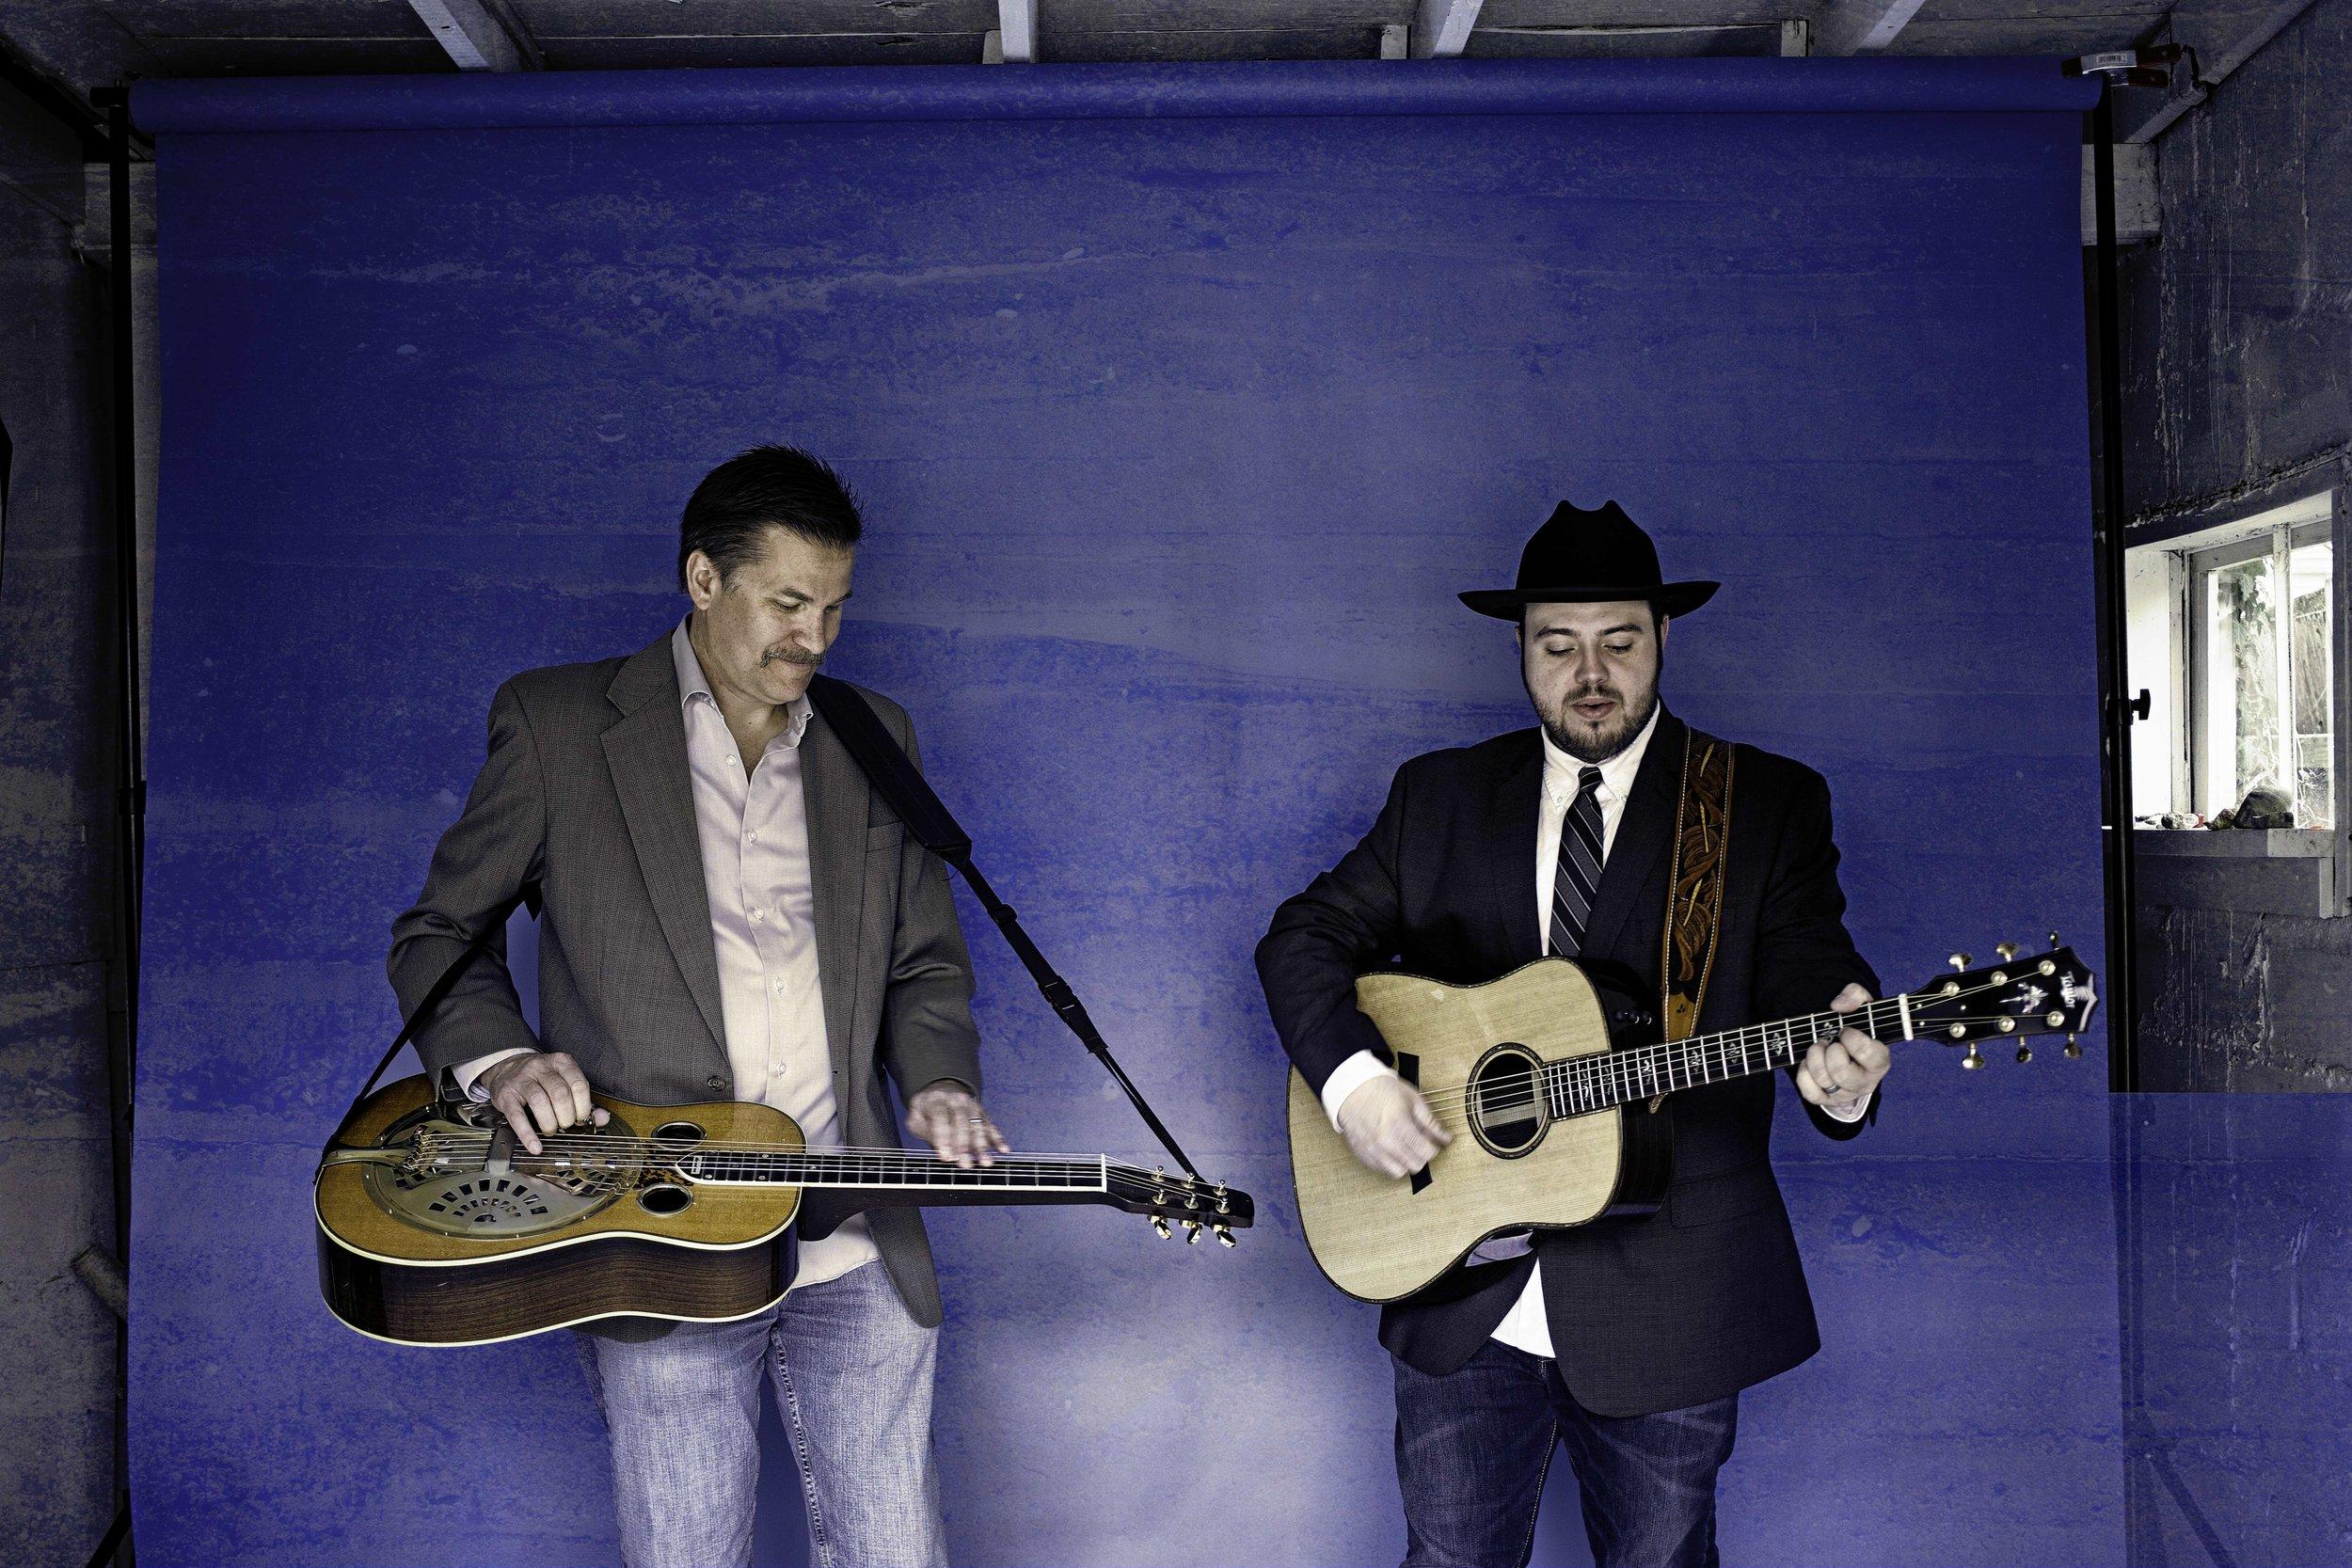 Rob and Trey | Blues, Folk, Rock  Friday 6:30 PM